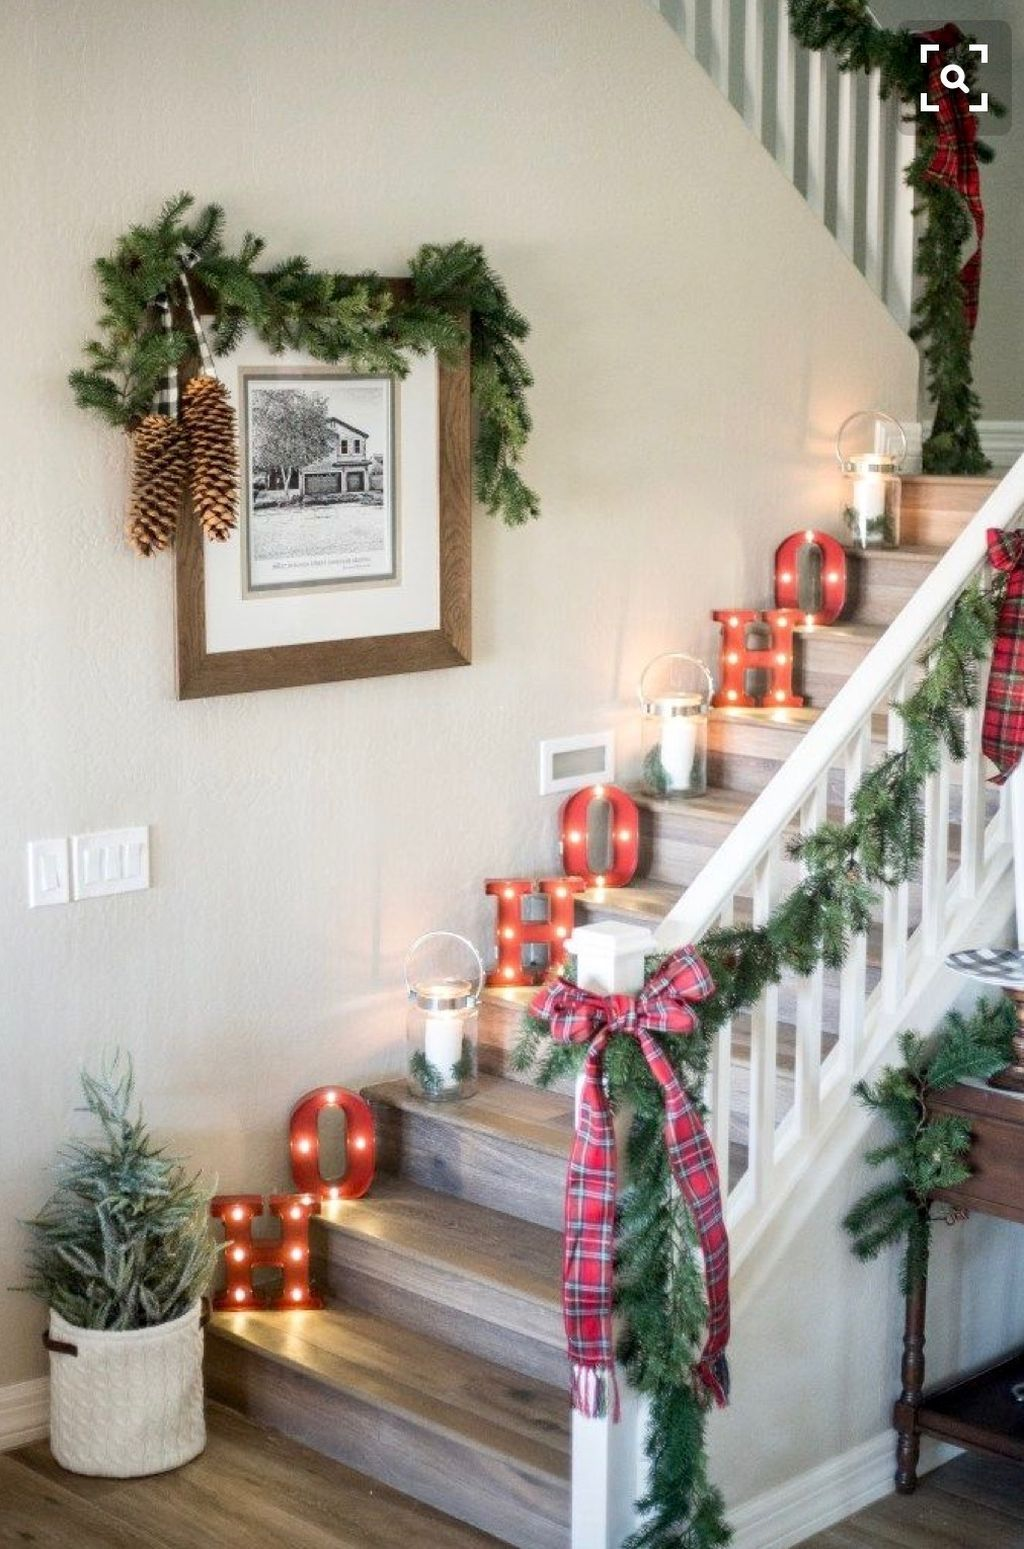 37 totally adorable traditional christmas decoration ideas home rh pinterest com